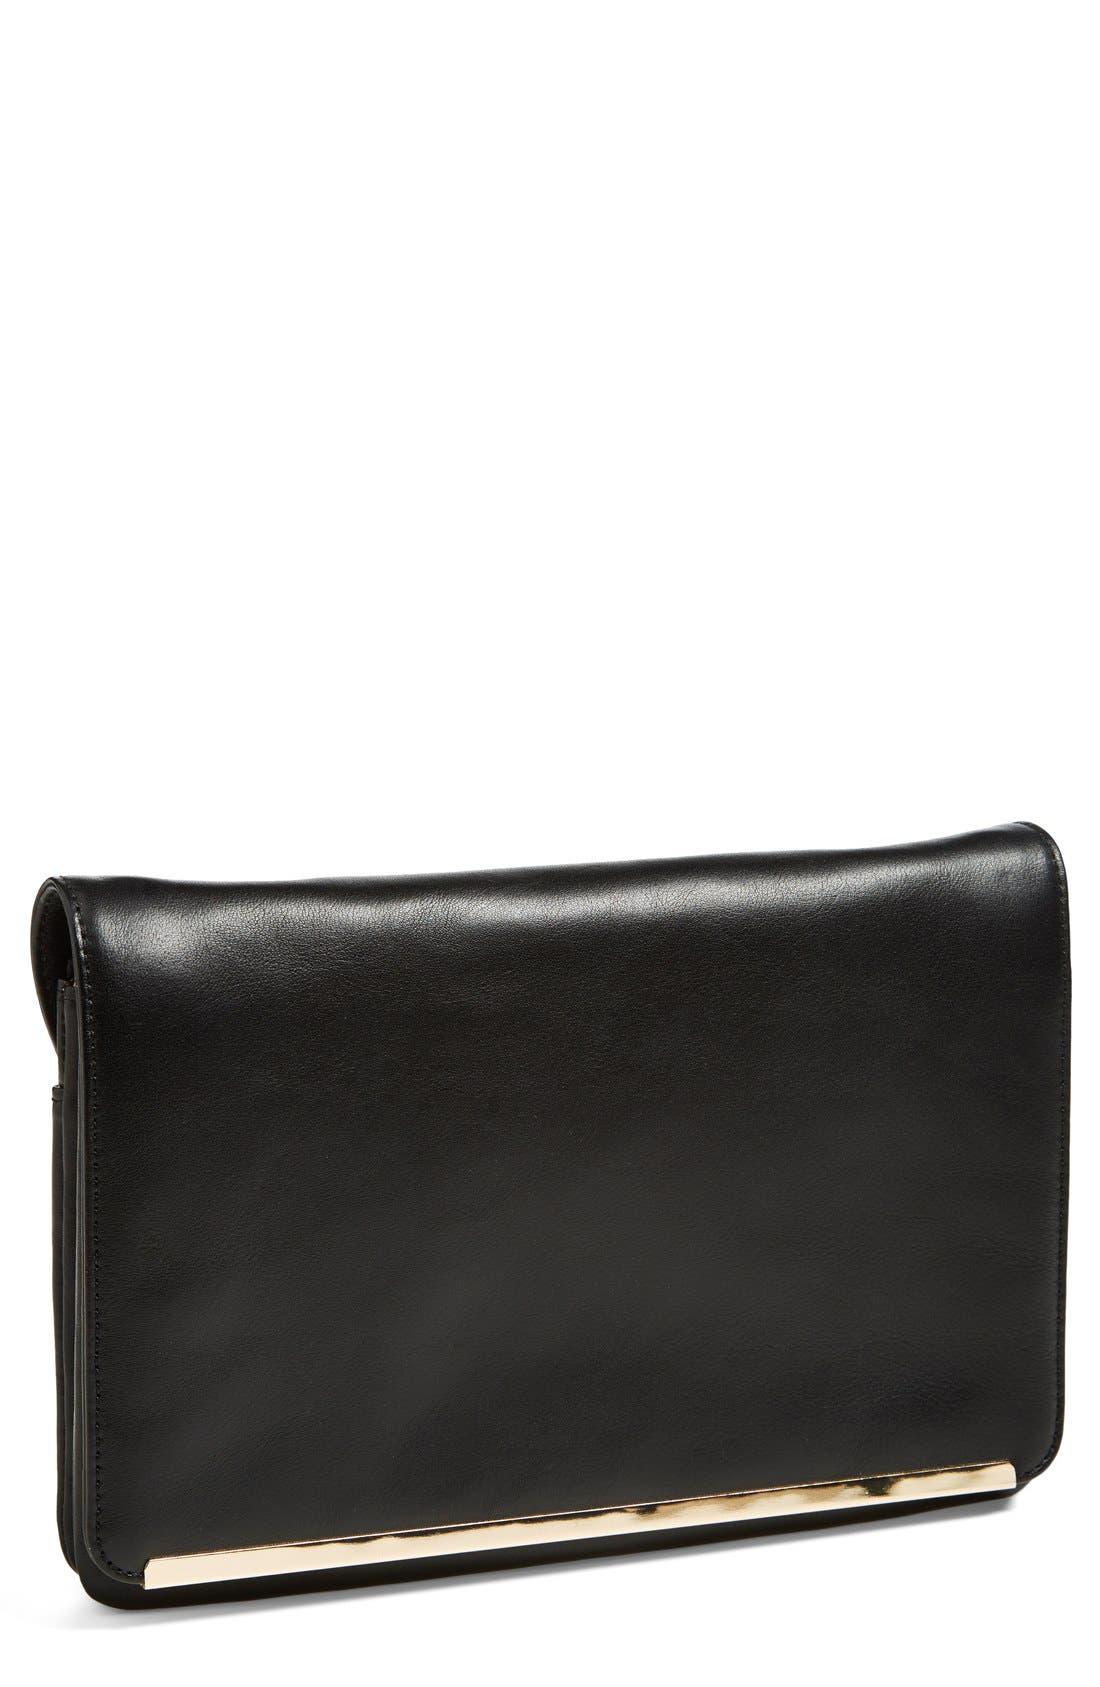 Leather Foldover Crossbody Clutch,                             Main thumbnail 1, color,                             001